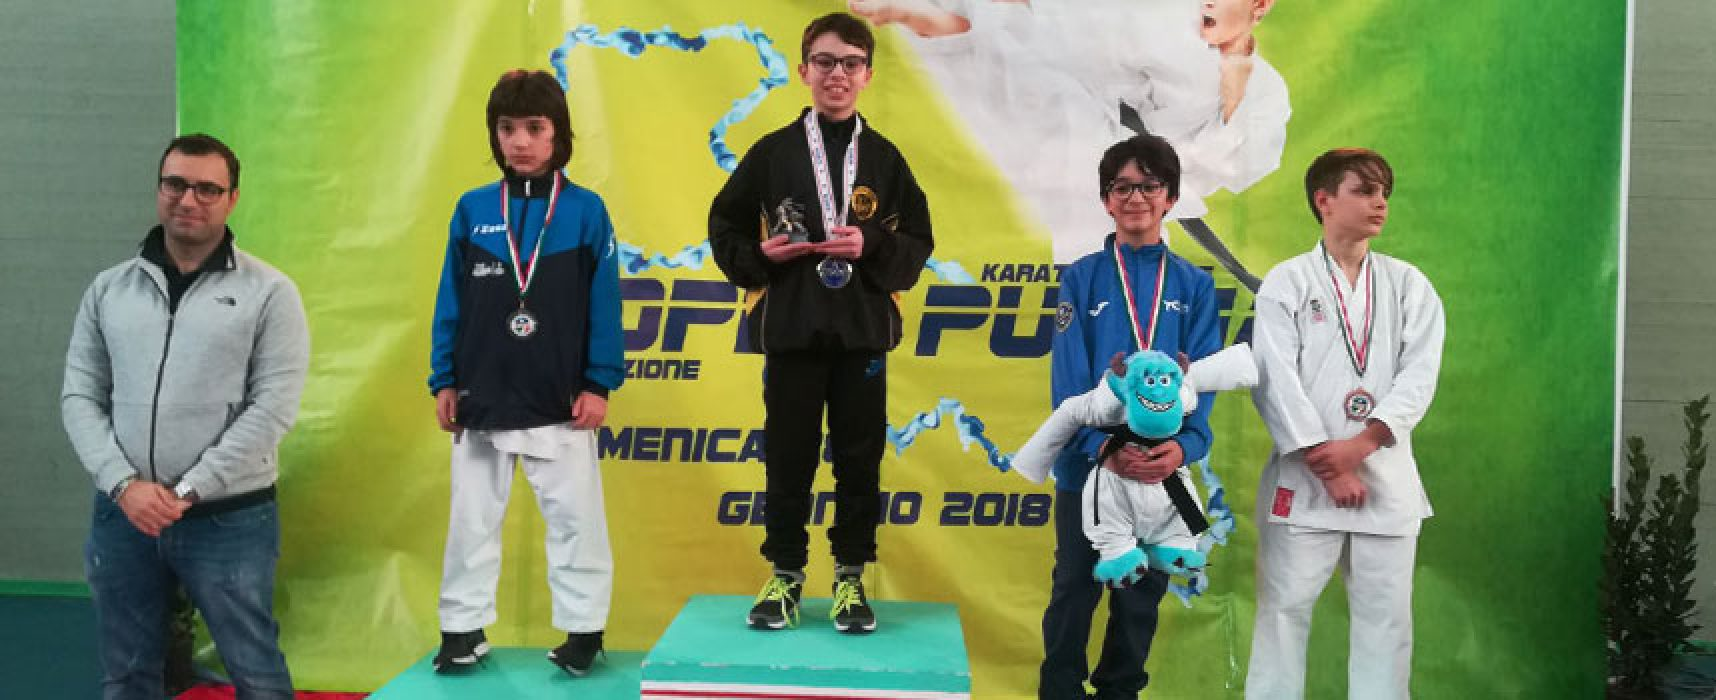 Coppa Puglia Karate Kumitè Csen, doppietta per i fratelli Papagni